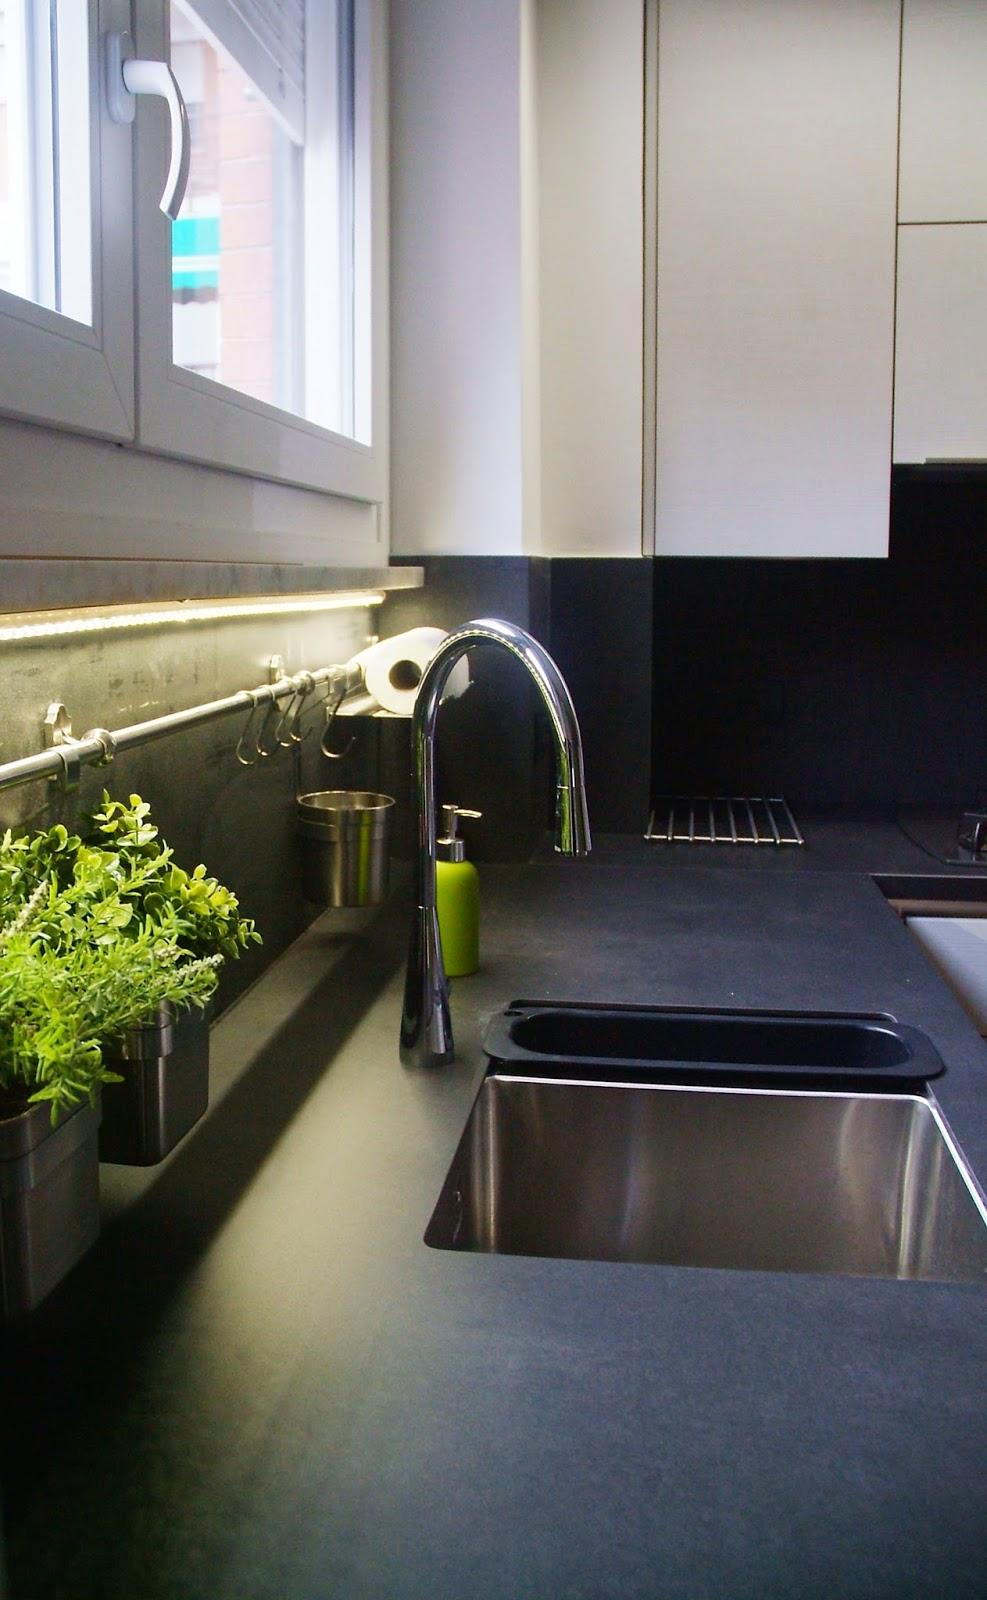 Illuminazione Led casa: Illuminazione sottopensile a Led. La luce ...